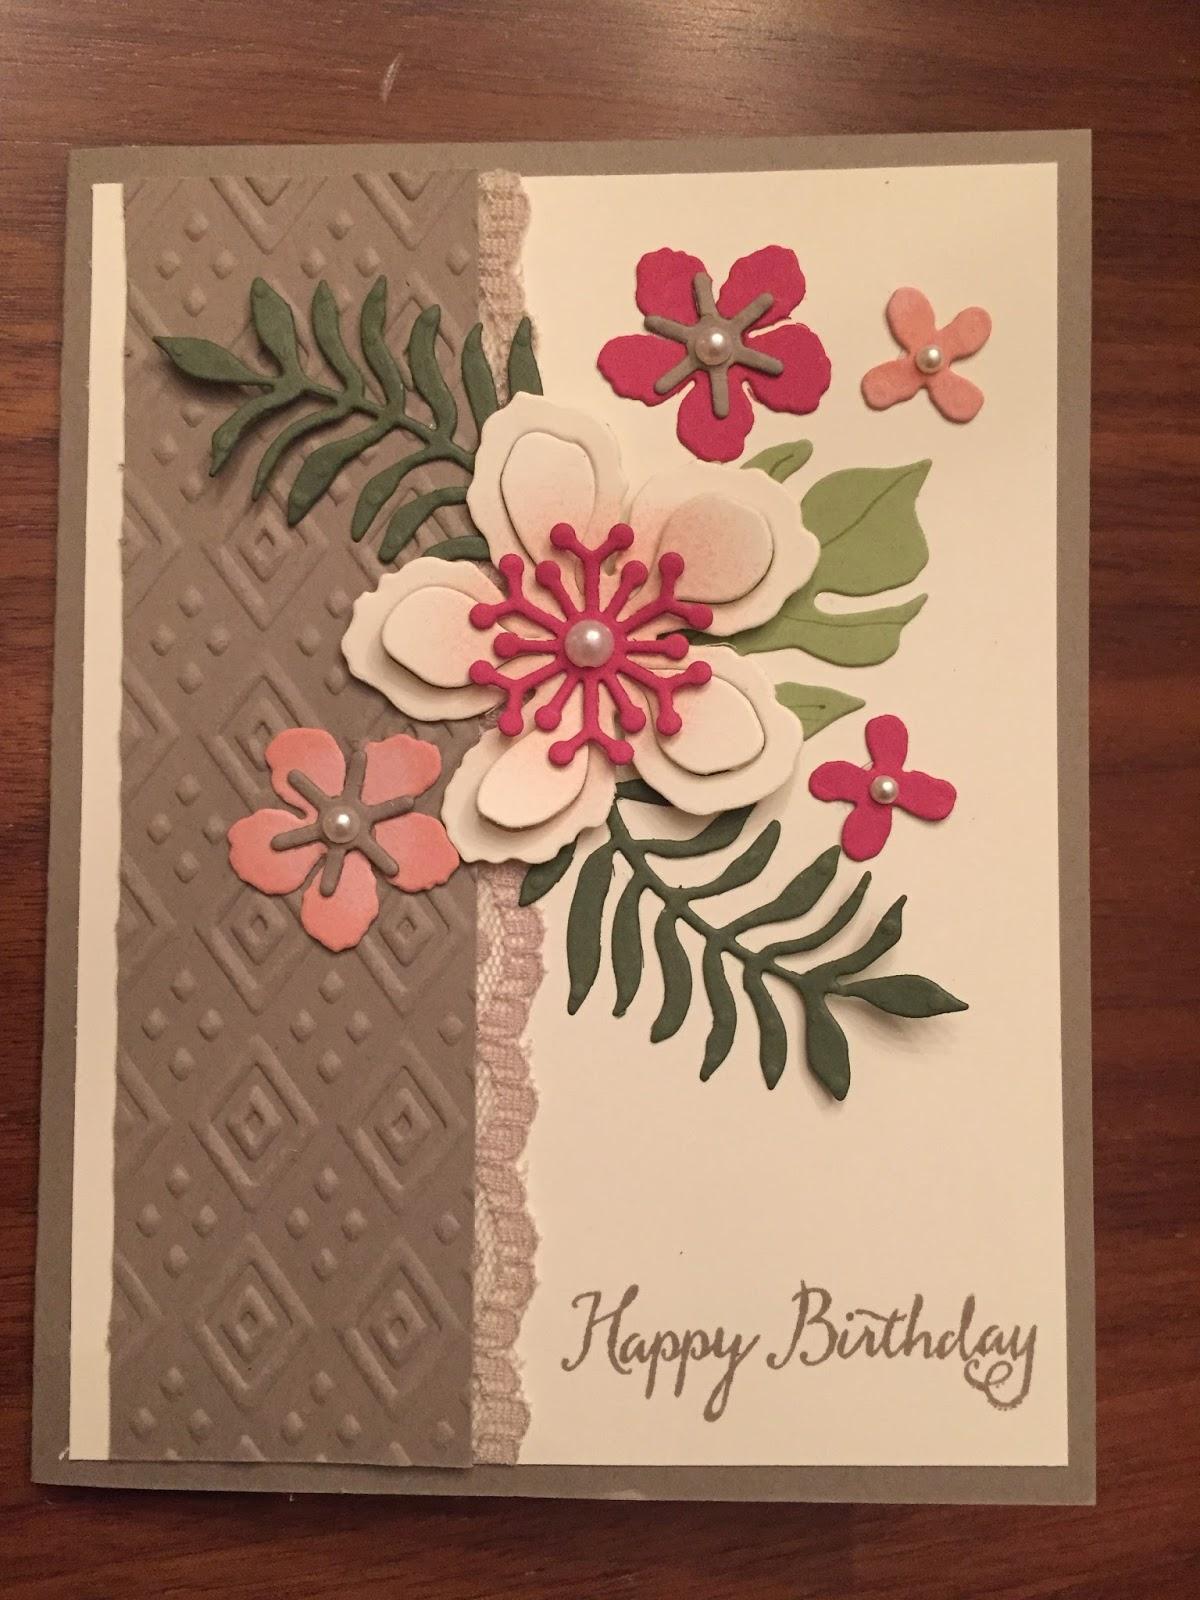 Blue Dahlia Designs Happy Birthday to My Sister Linda – Happy Birthday Card to My Sister